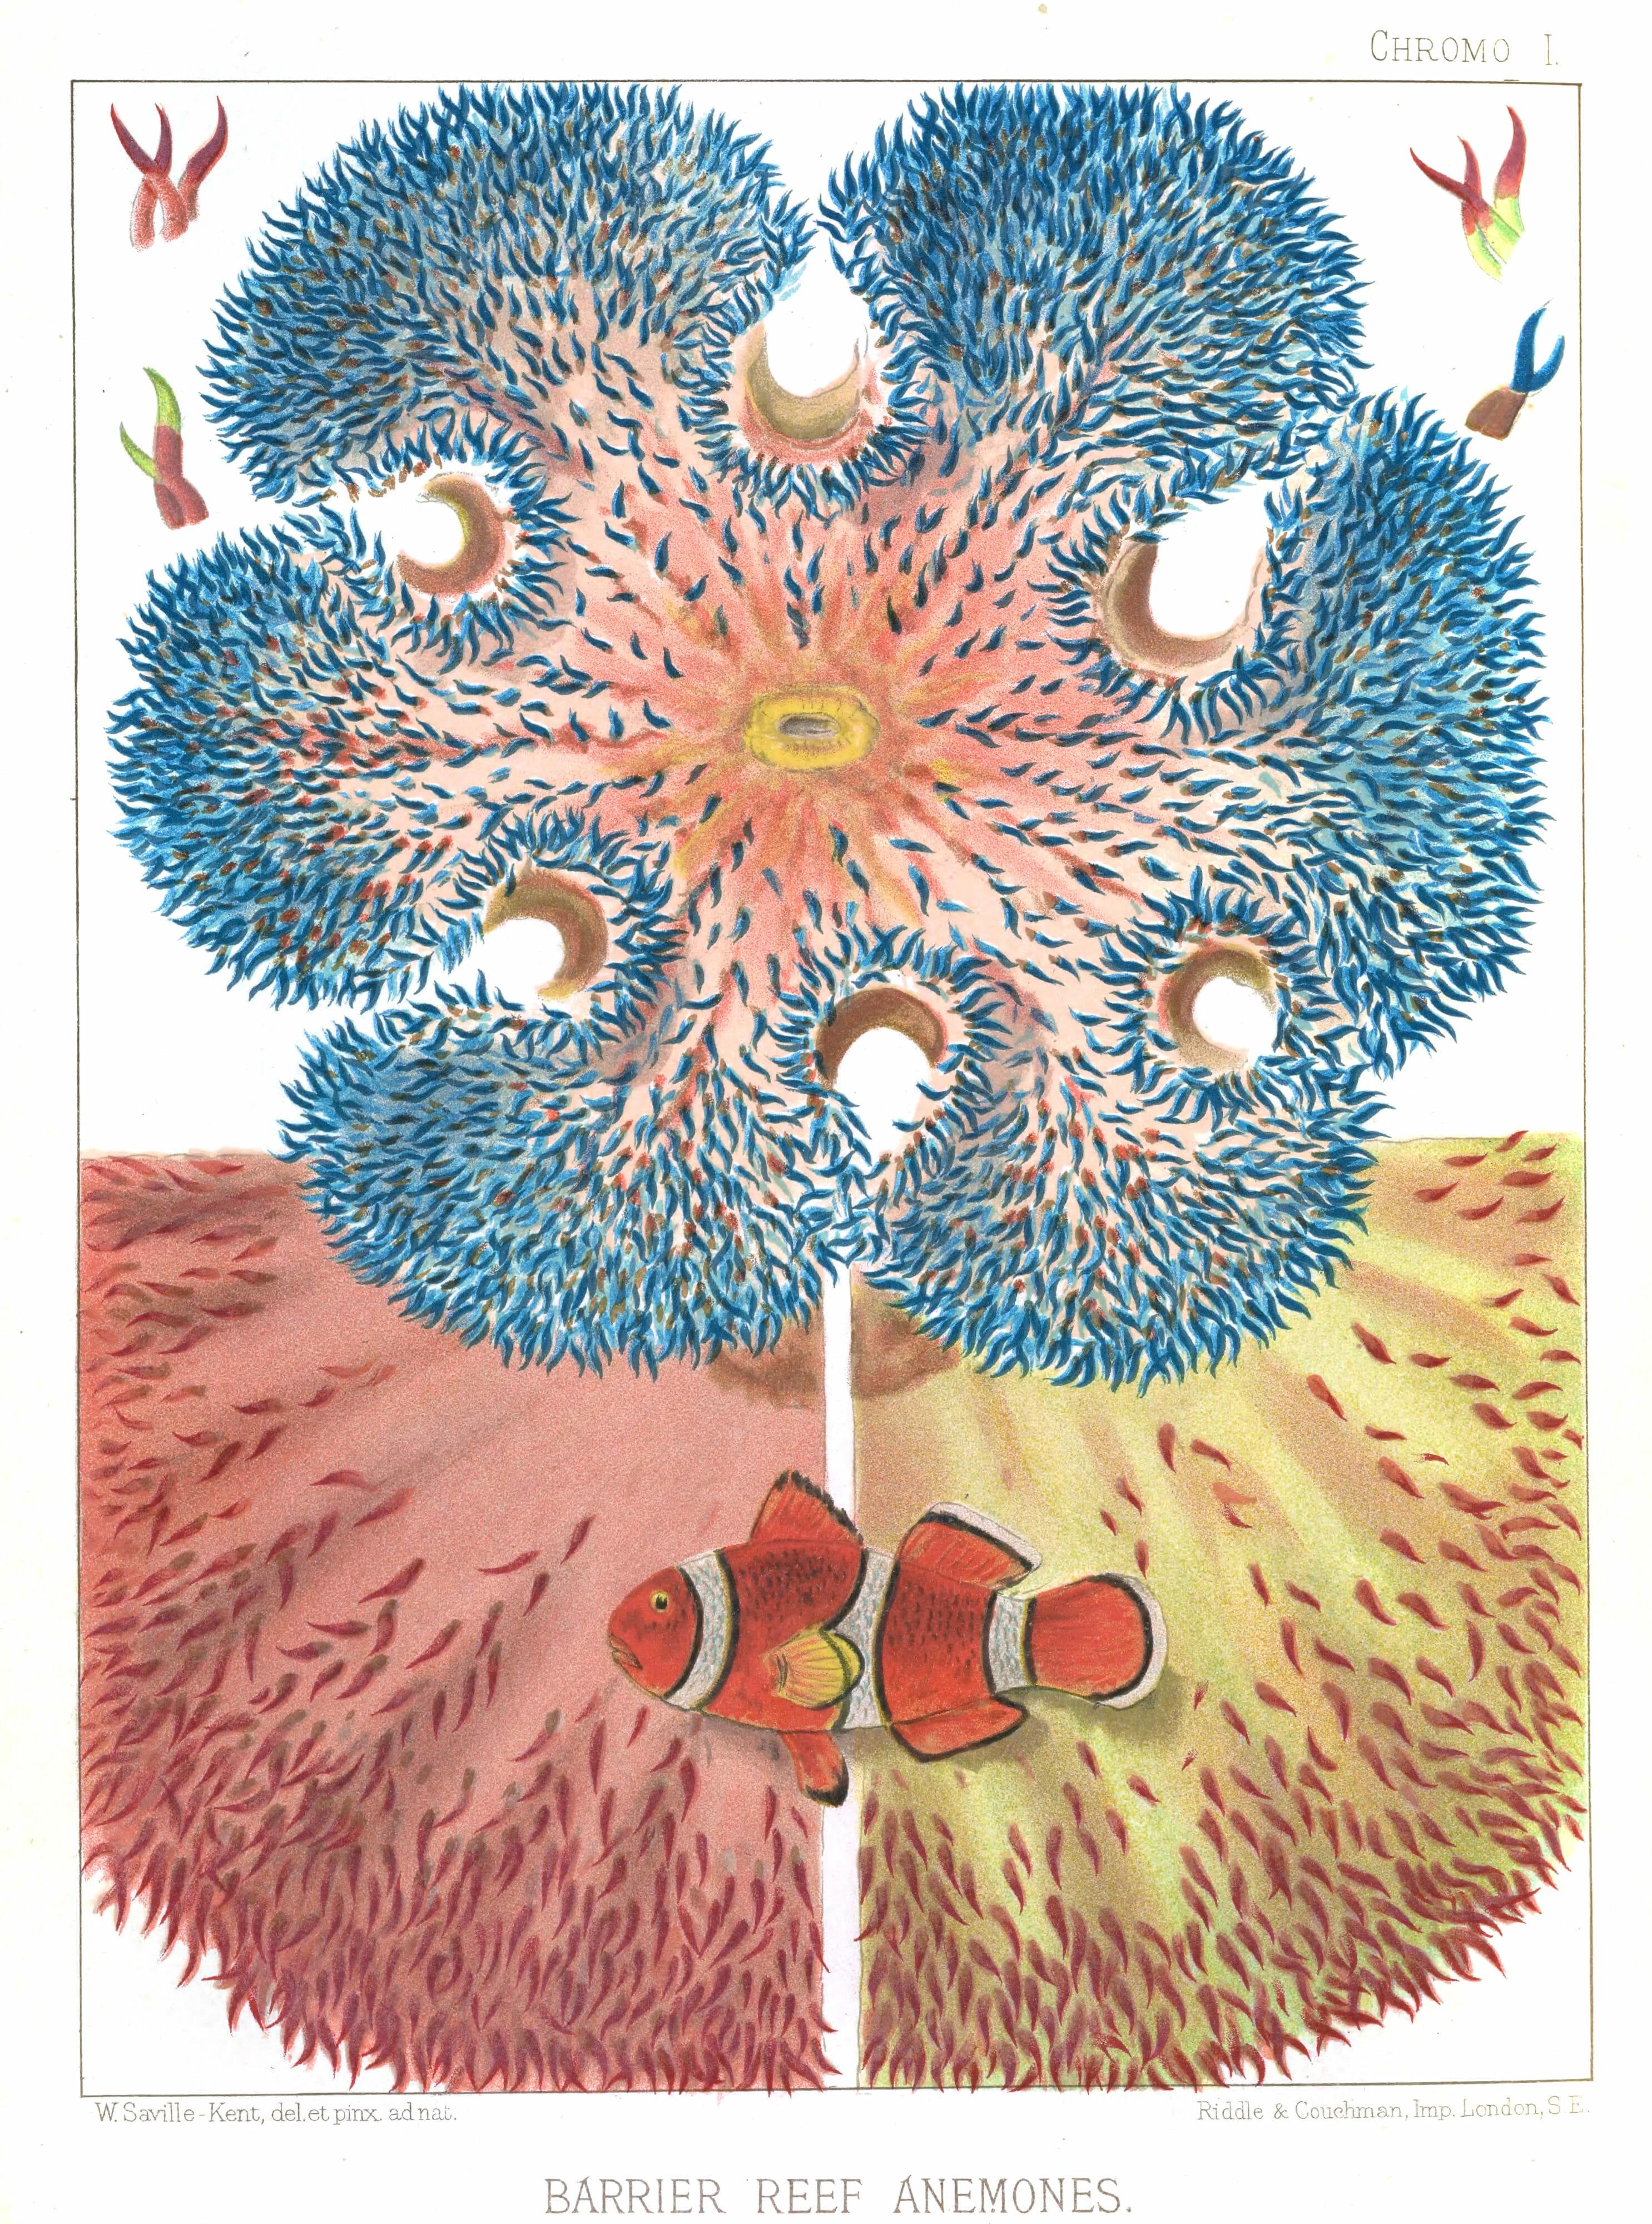 Vintage public domain illustration of great barrier reef anemones